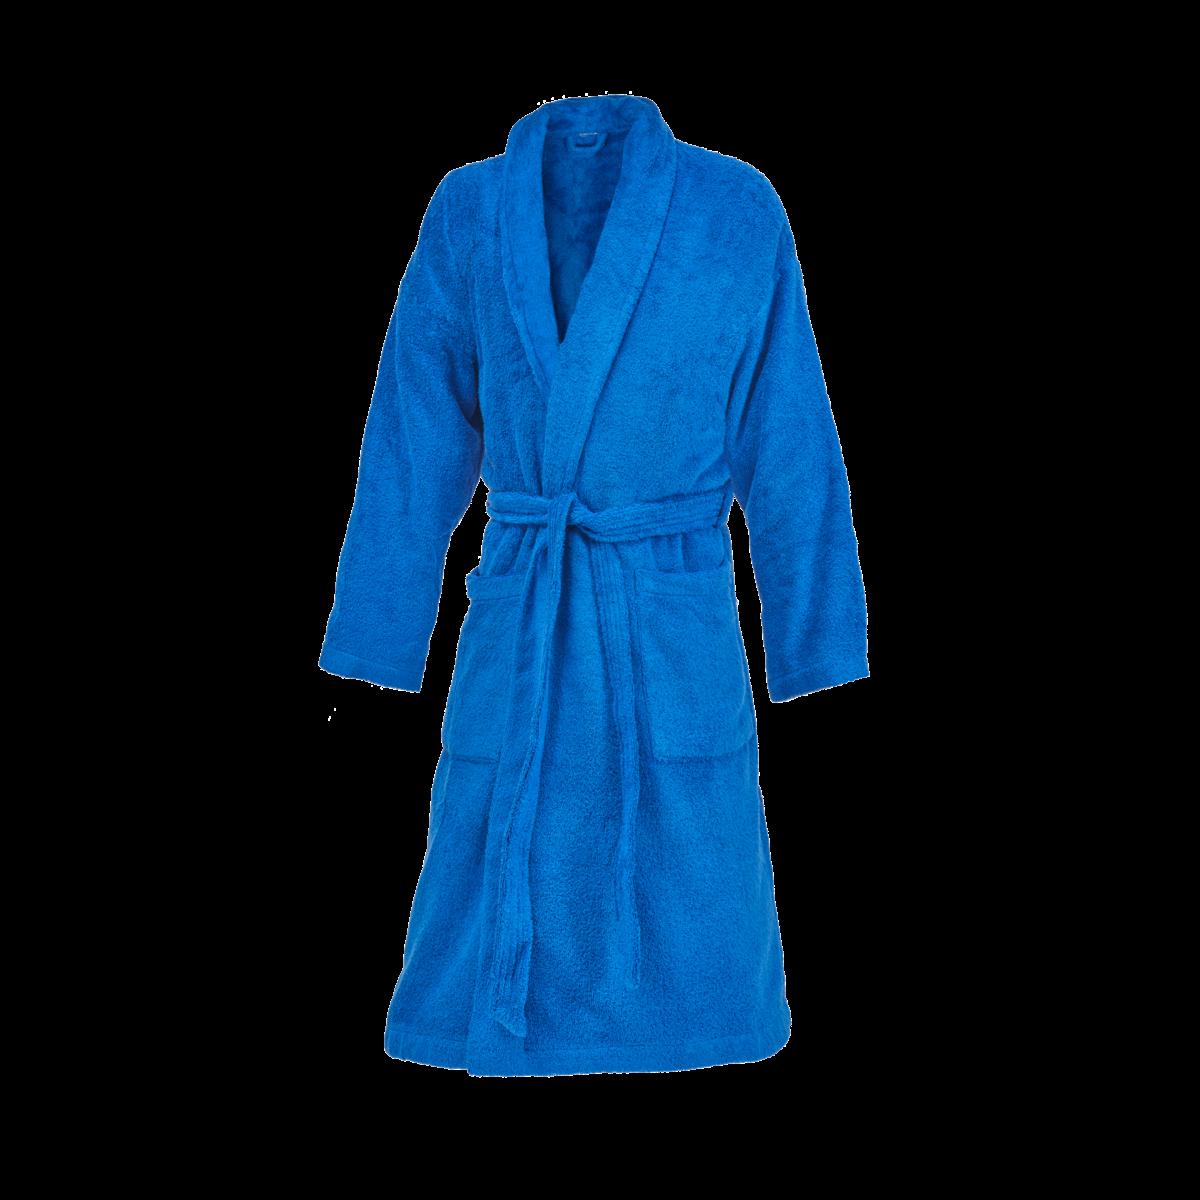 basic ROYAL BLUE   SHAWL COLLAR  ROBE UNISEX